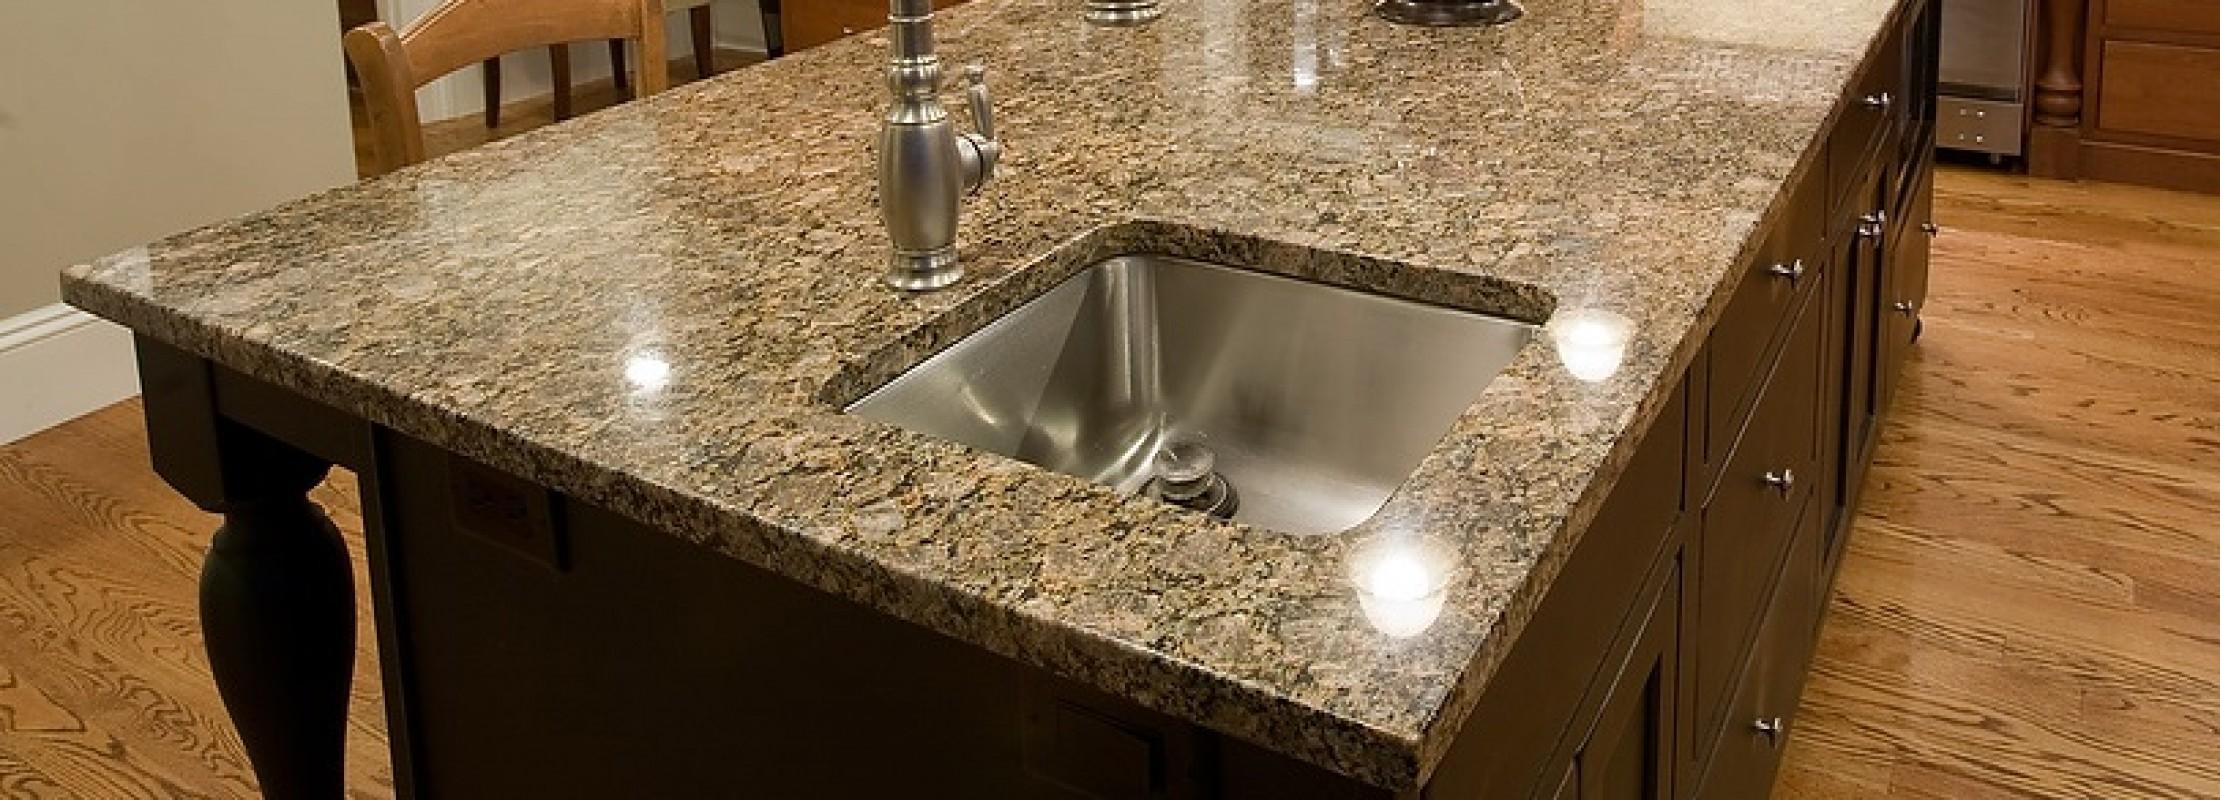 Granito o quarzo in cucina? - | Blog Edilnet